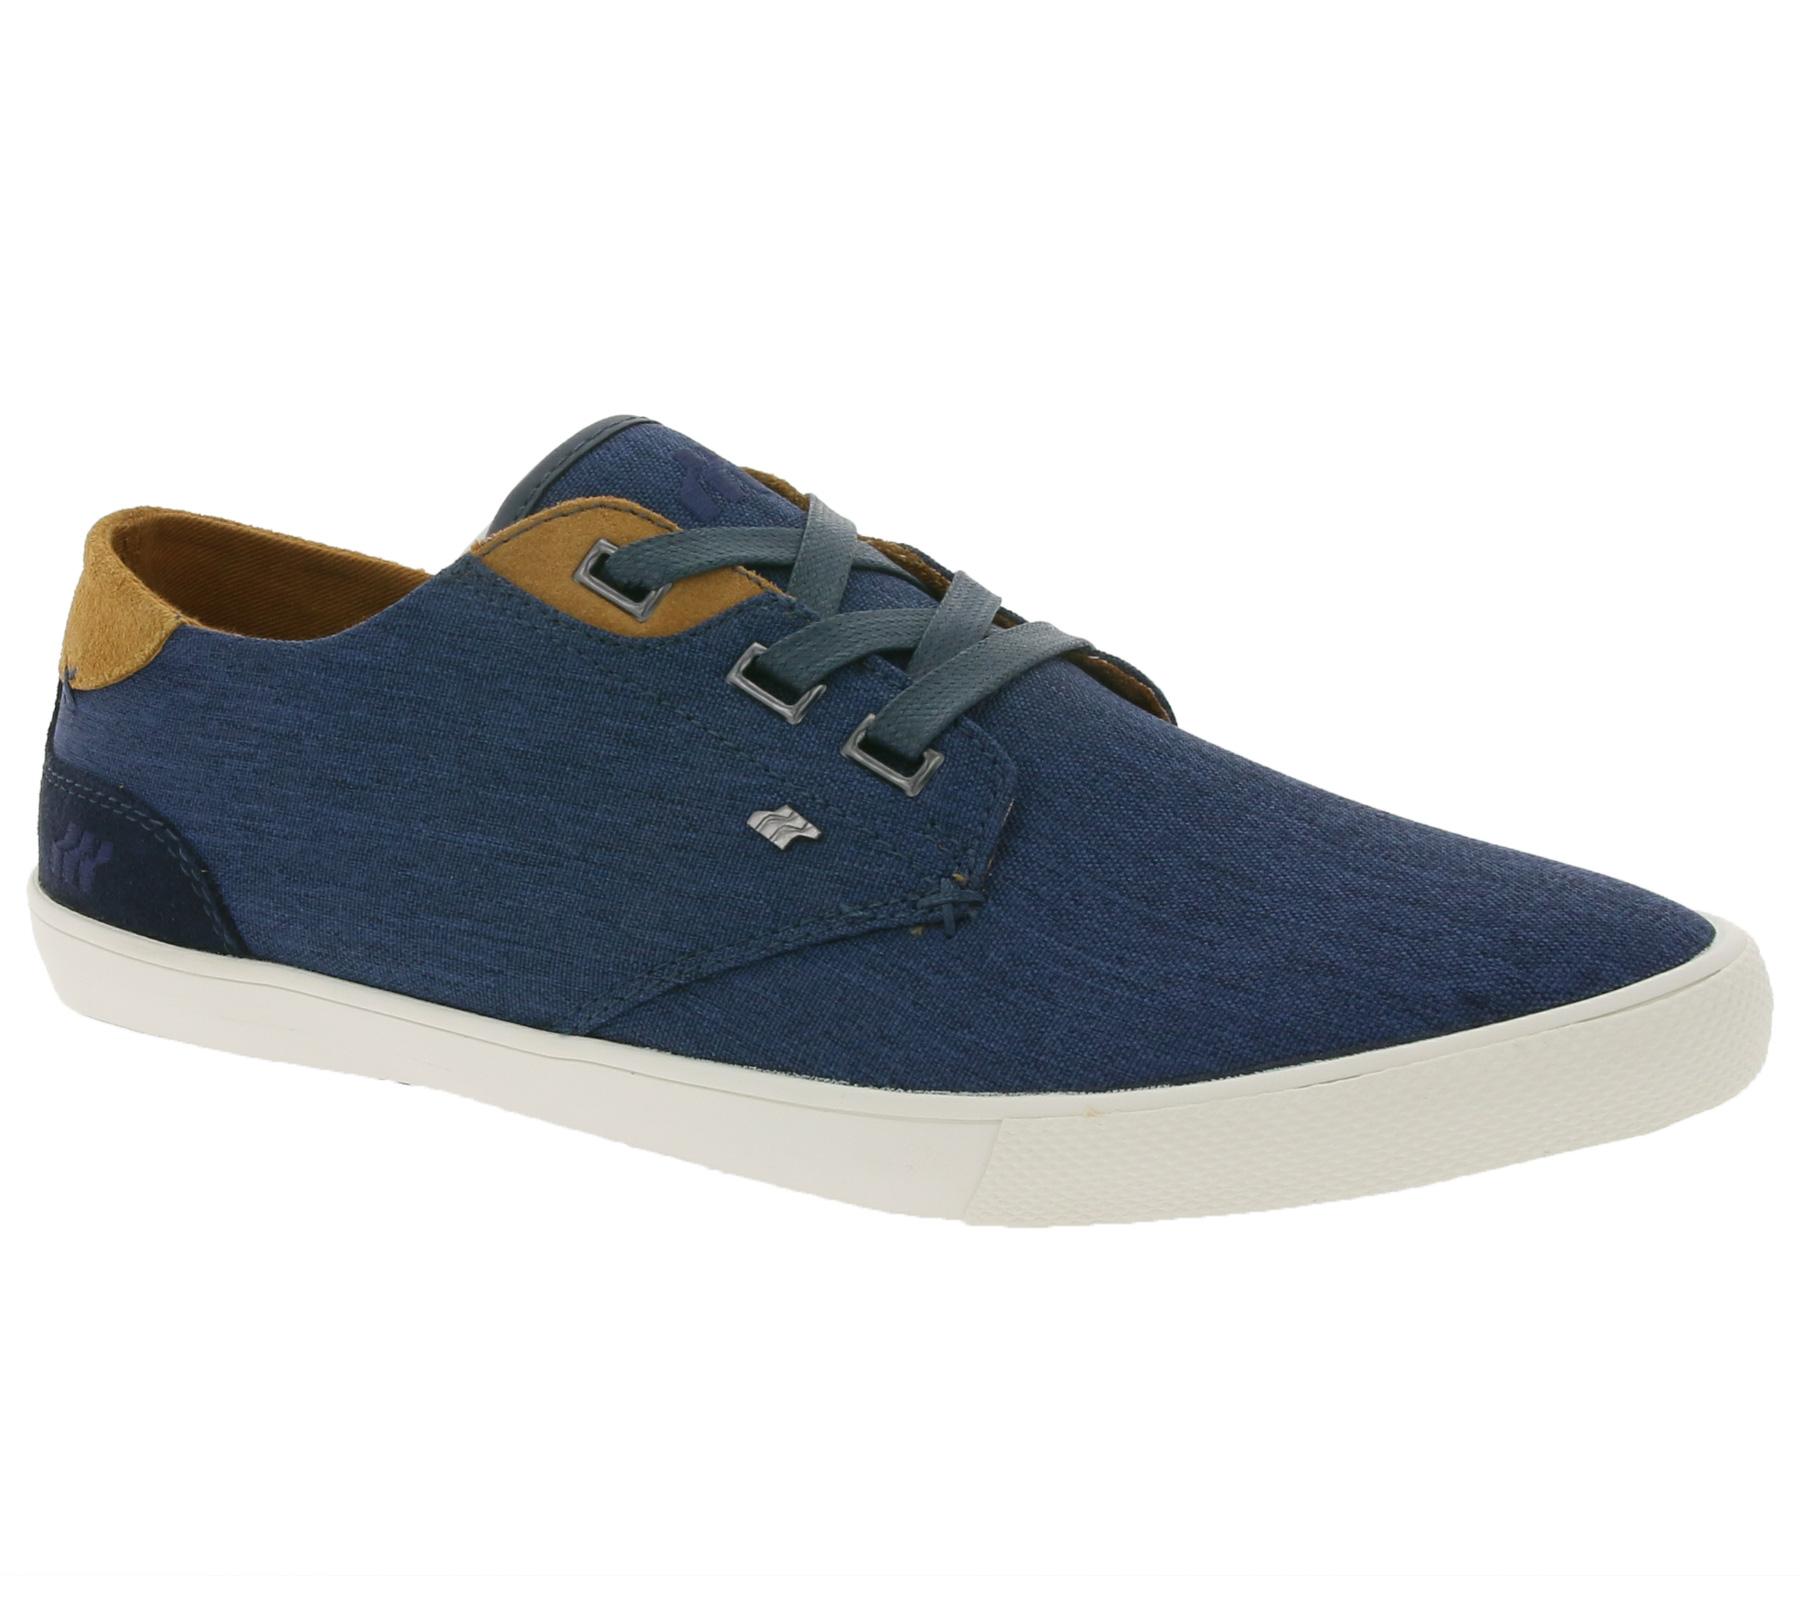 Boxfresh Shoes Low top Fashionable Men's Sneaker Navy |